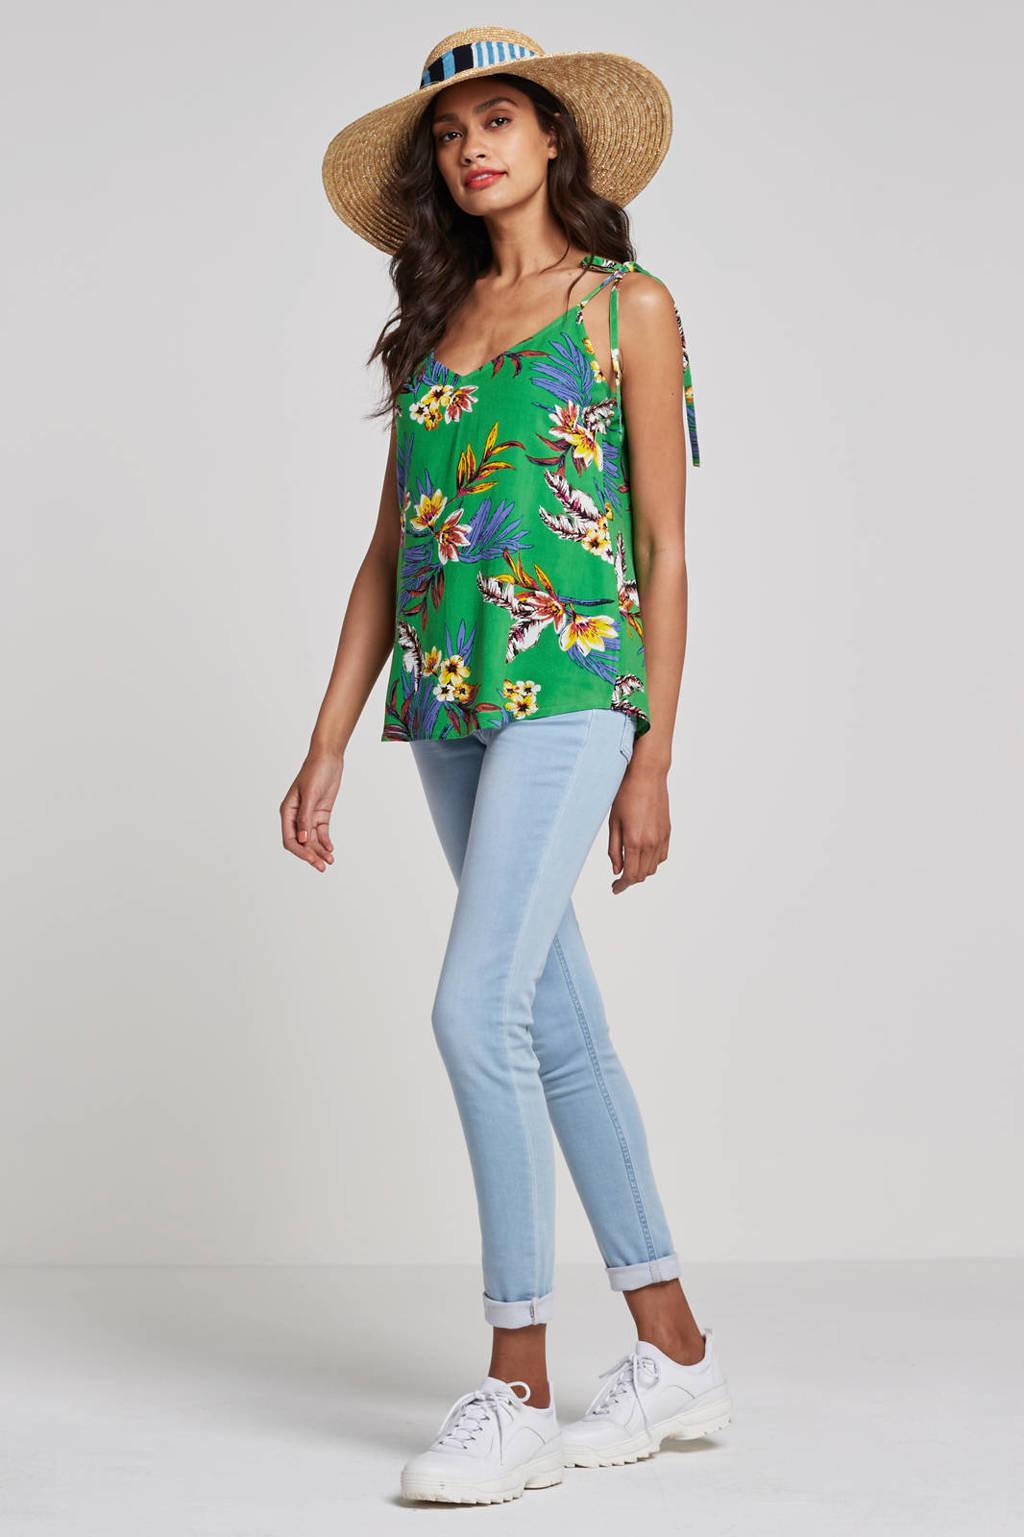 whkmp's own skinny jog jeans, Bleached lichtblauw